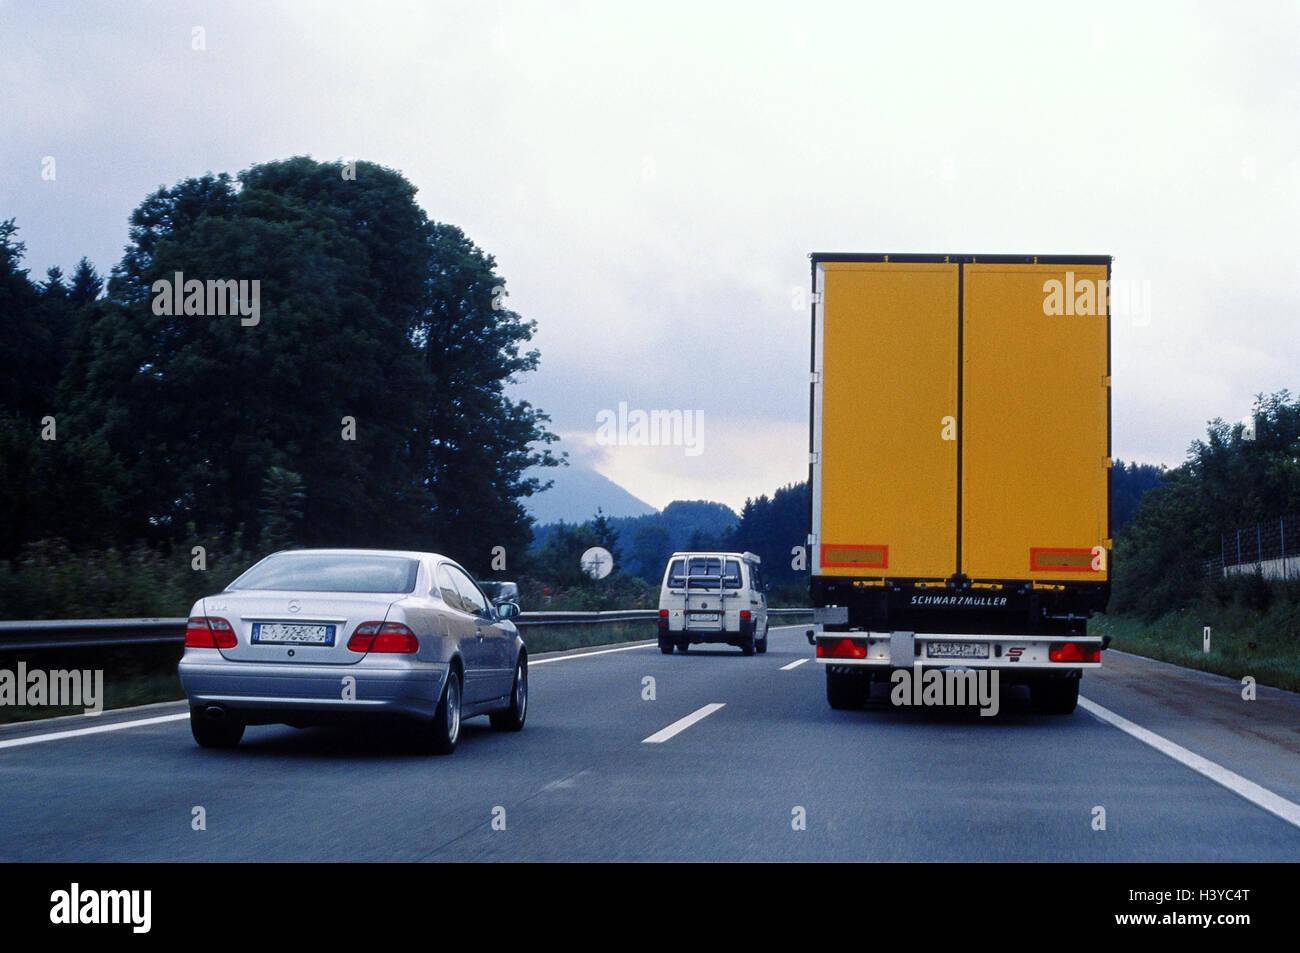 Highway, traffic, cars, trucks overtaking manoeuvre, rear view! CAR REGISTRATION NUMBERS UNRECOGNIZABLE MAKE! Street, - Stock Image